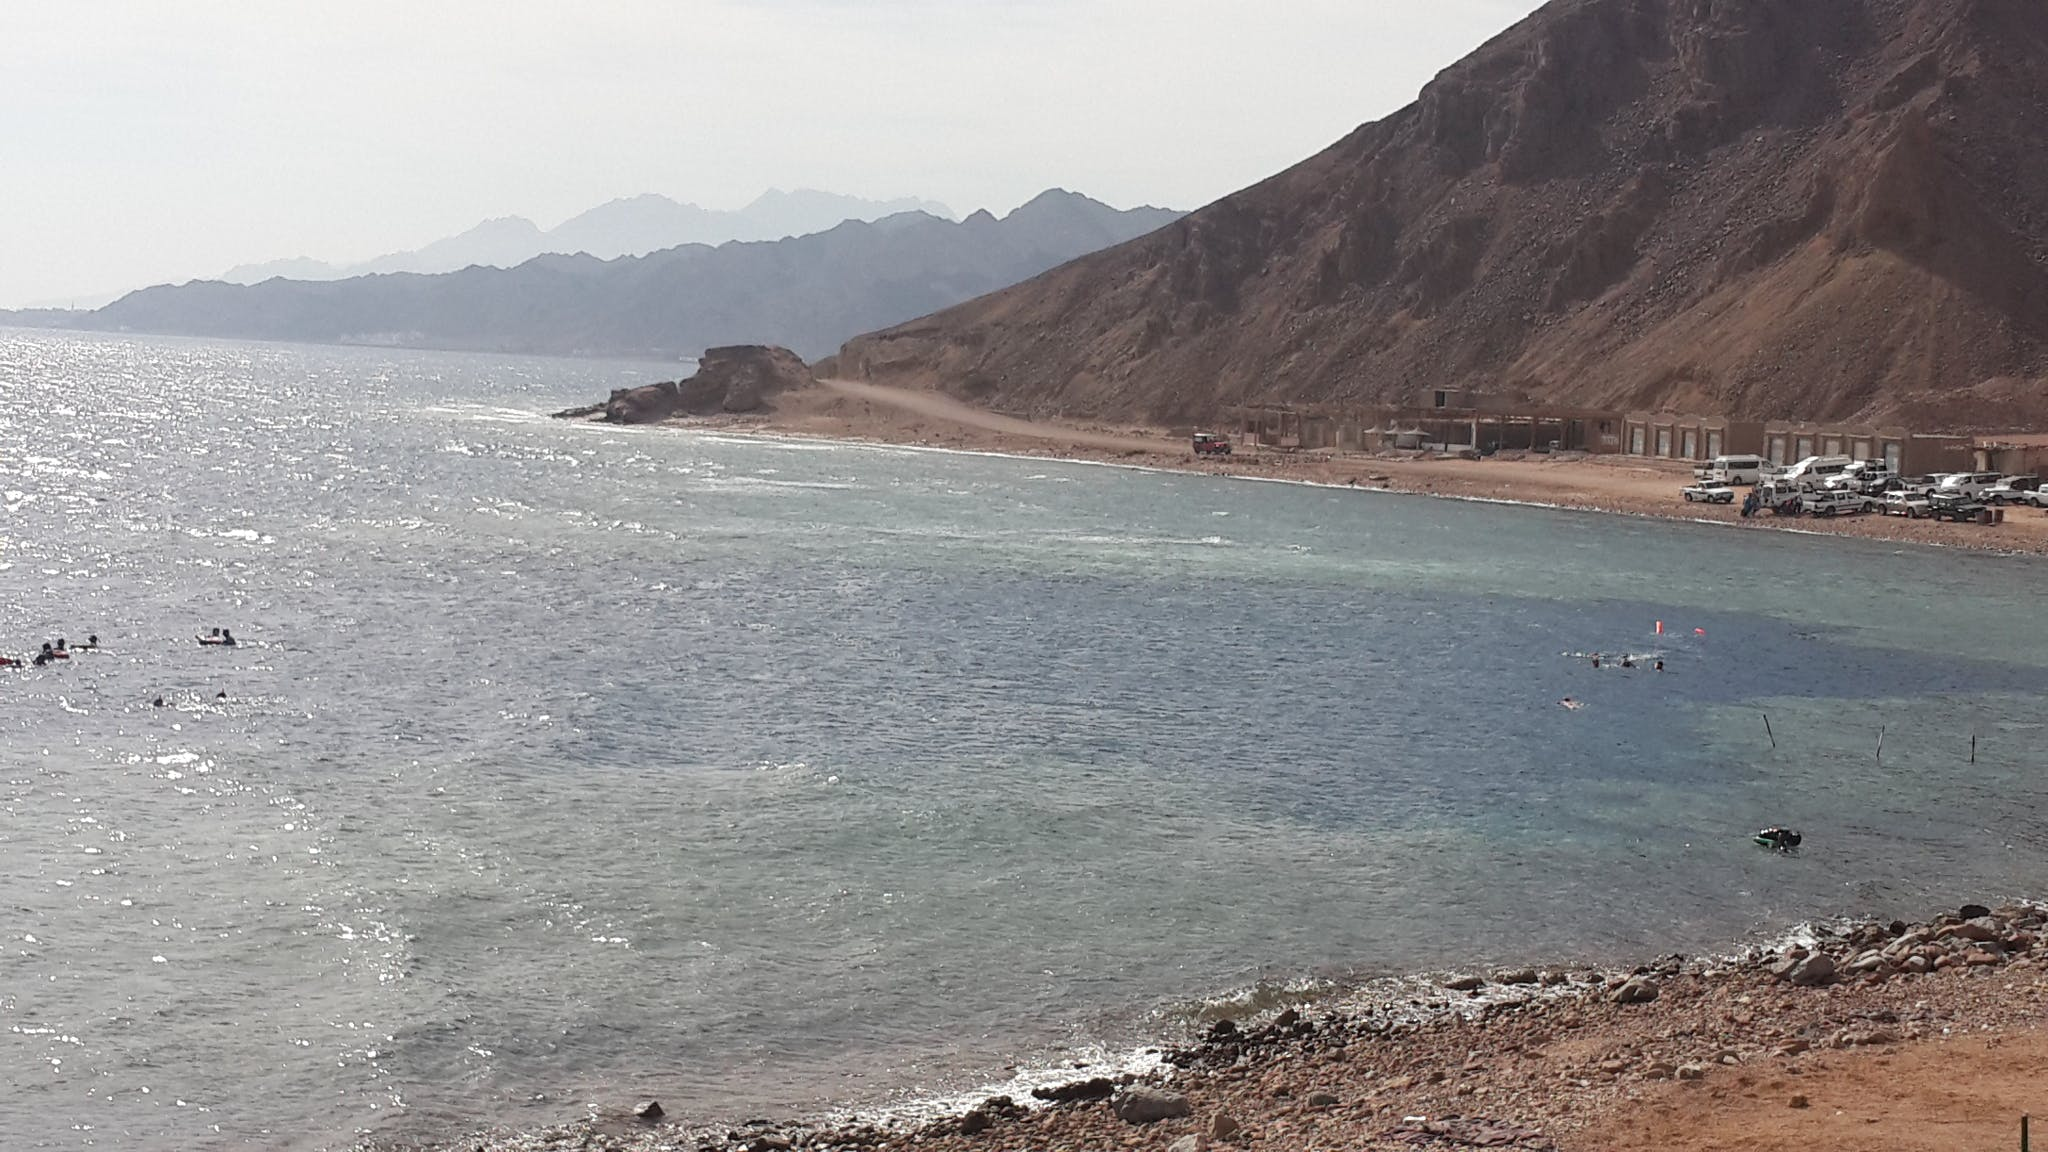 Free stock photo of blue hole in Dahab Egypt